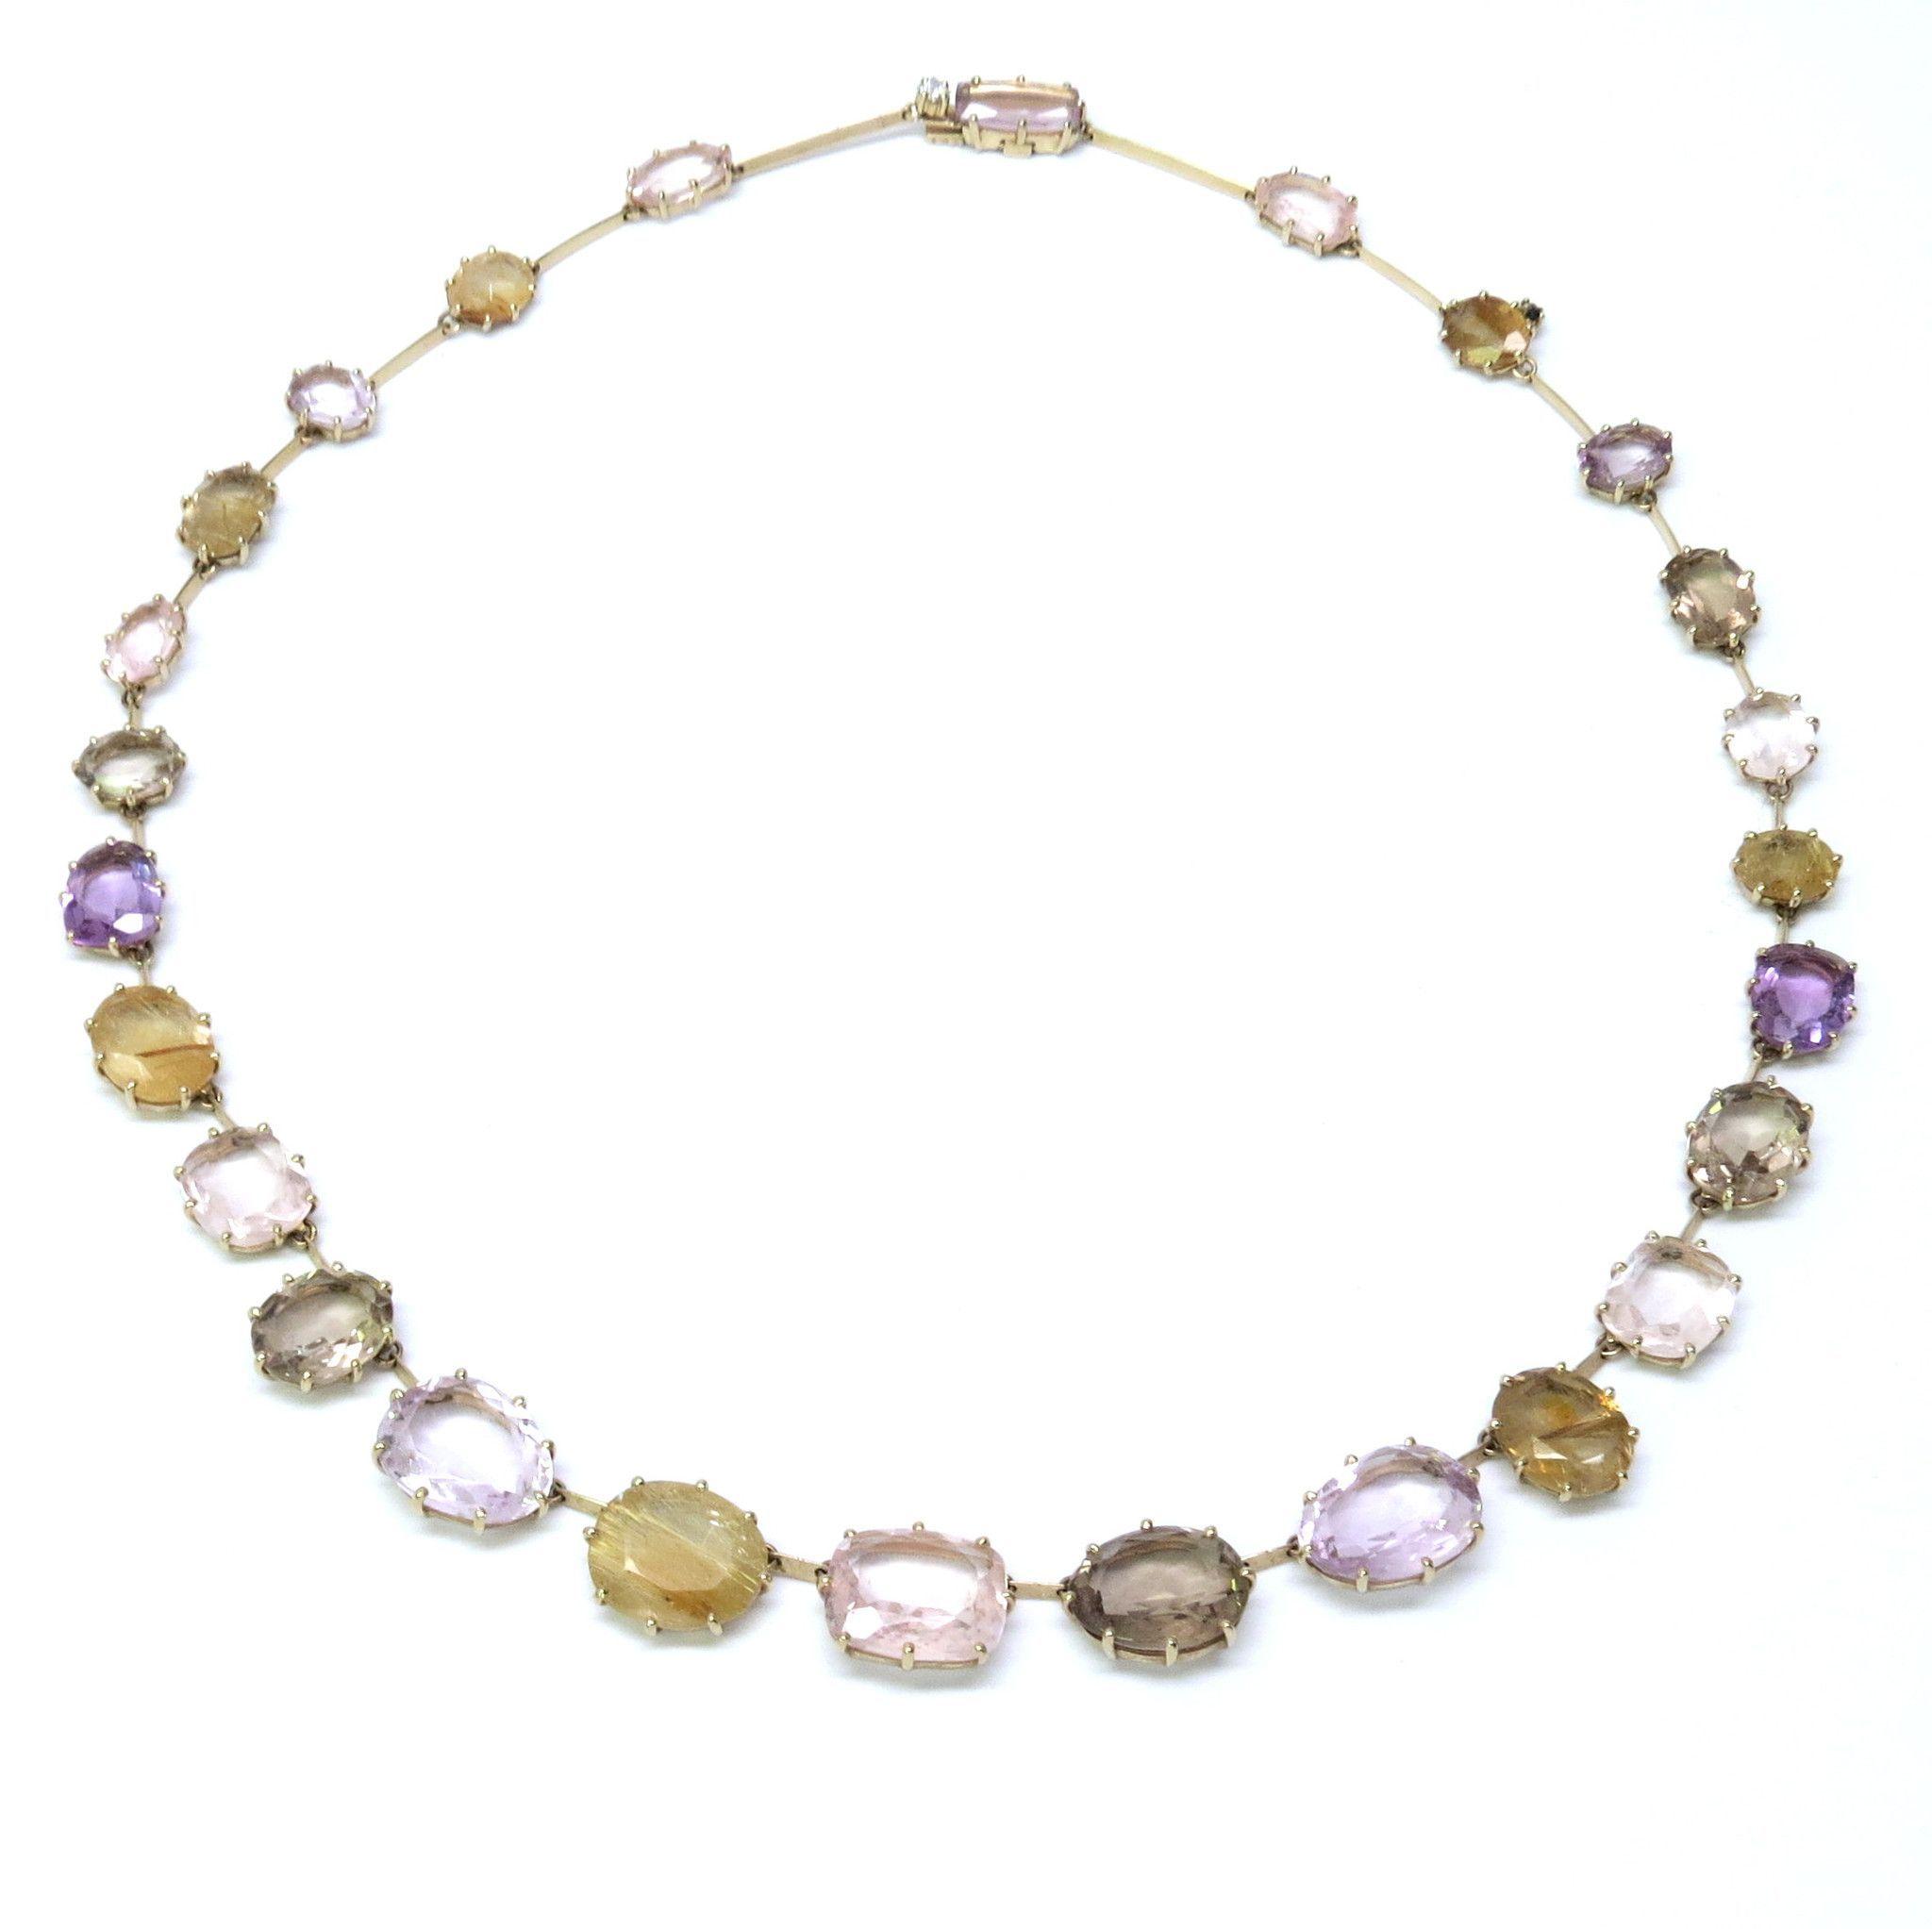 3b22bc292 H. Stern Sunrise Collection Gold Quartz Amethyst Diamond Necklace ...